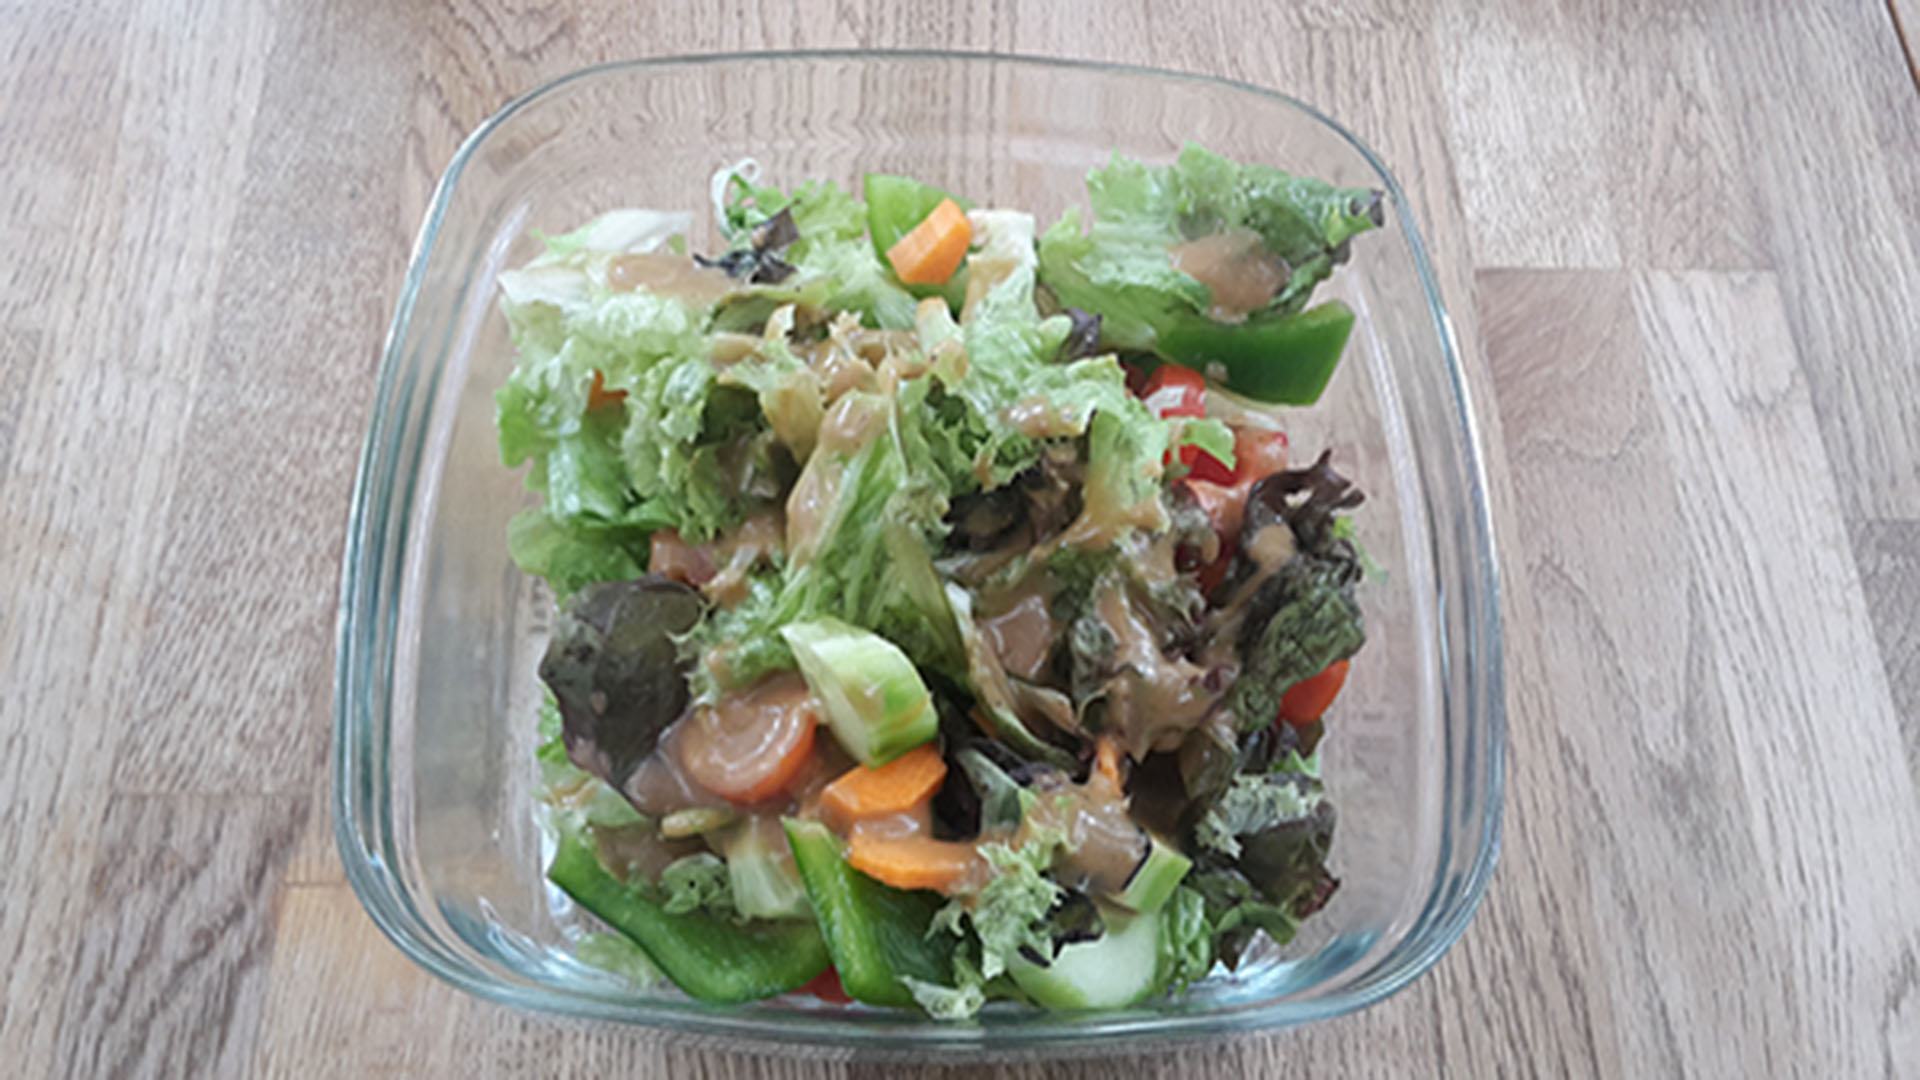 gemischter salat rezept mit bild kochen. Black Bedroom Furniture Sets. Home Design Ideas